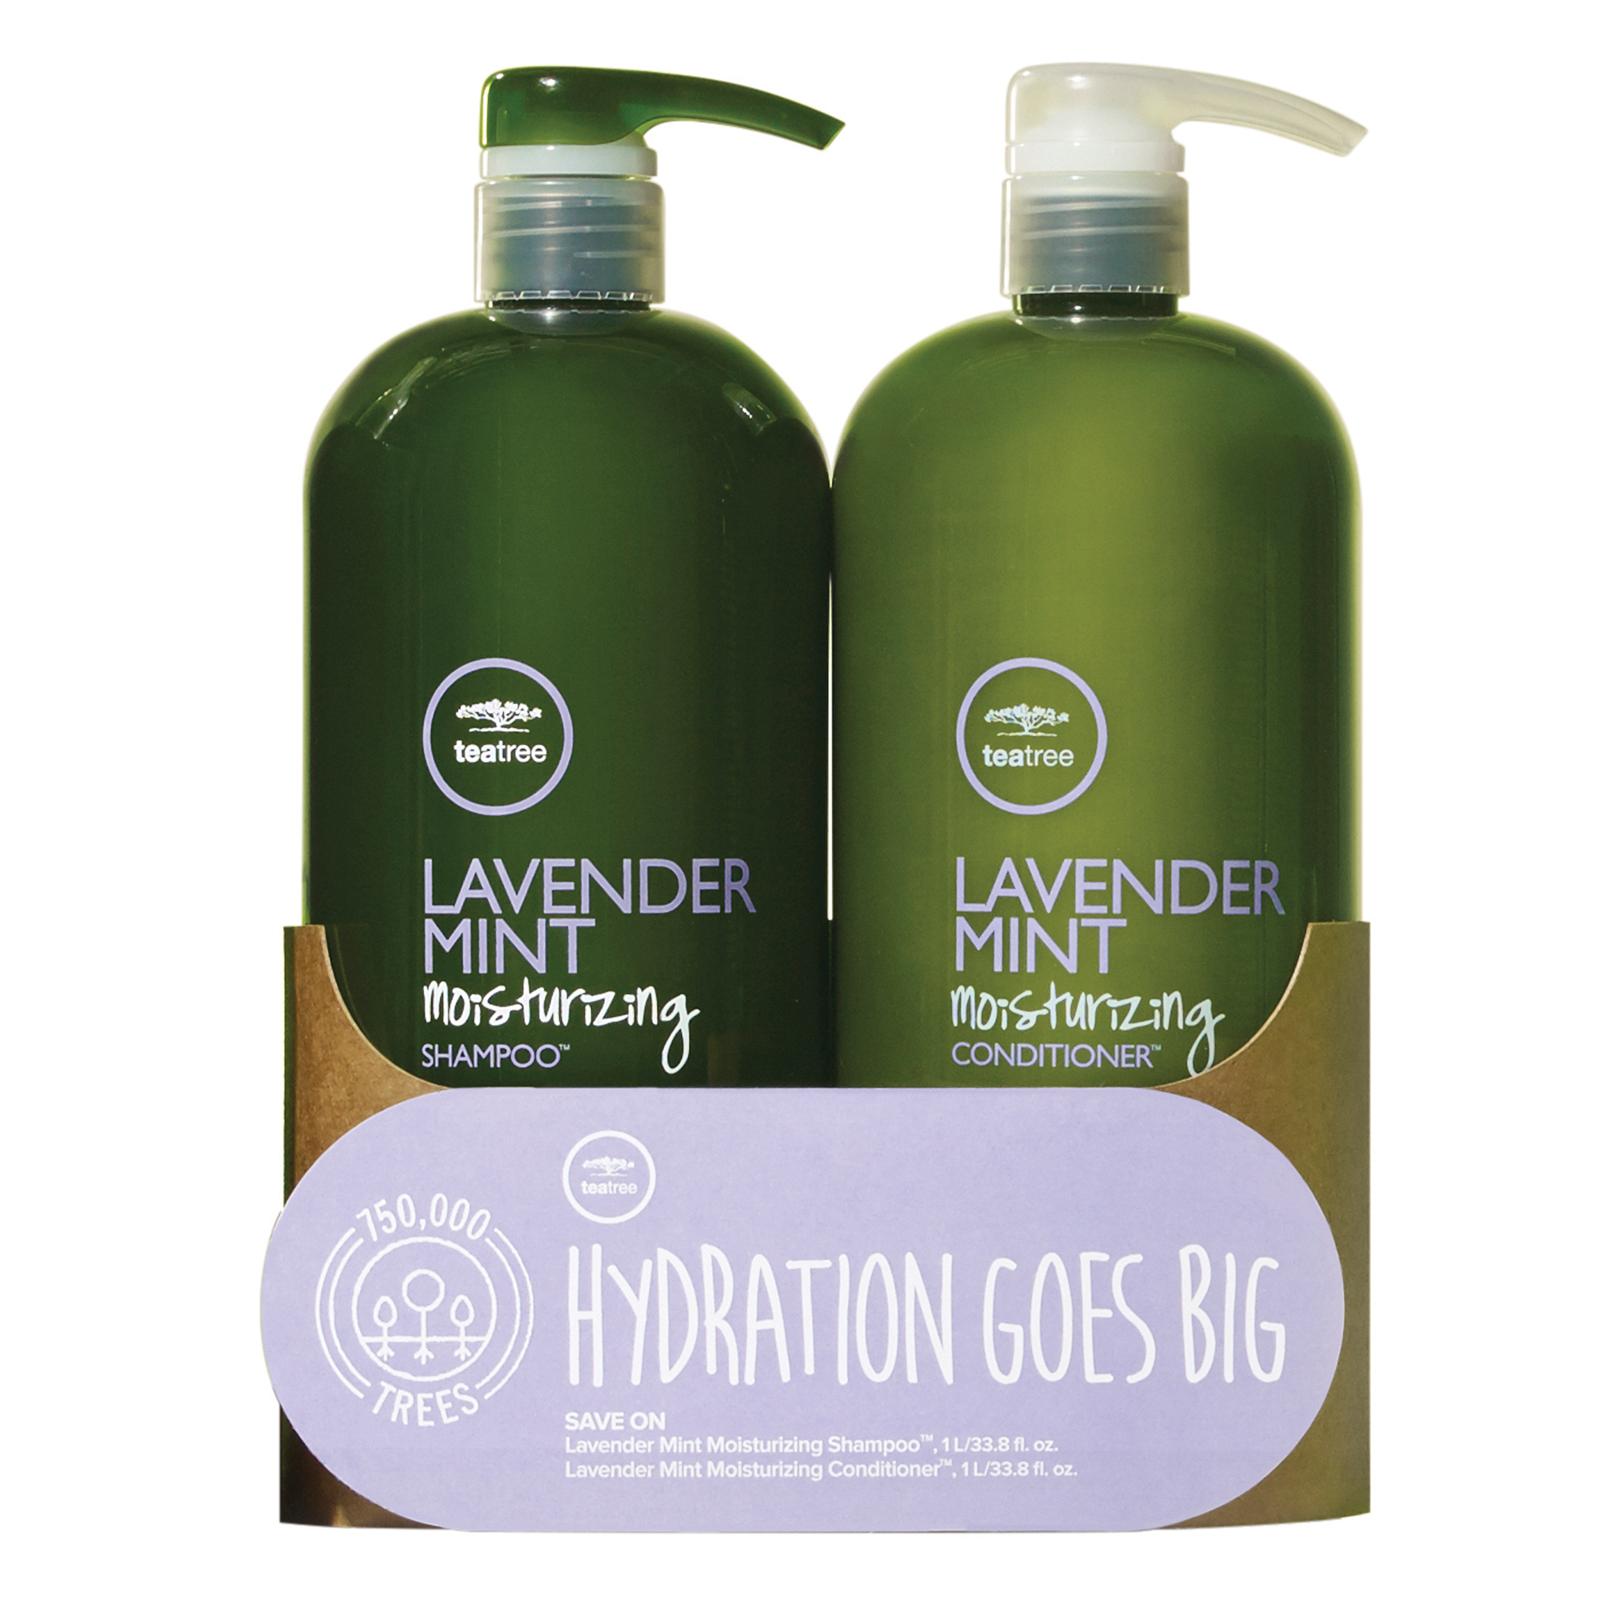 Tea Tree Lavender Mint Shampoo Conditioner Liter Duo